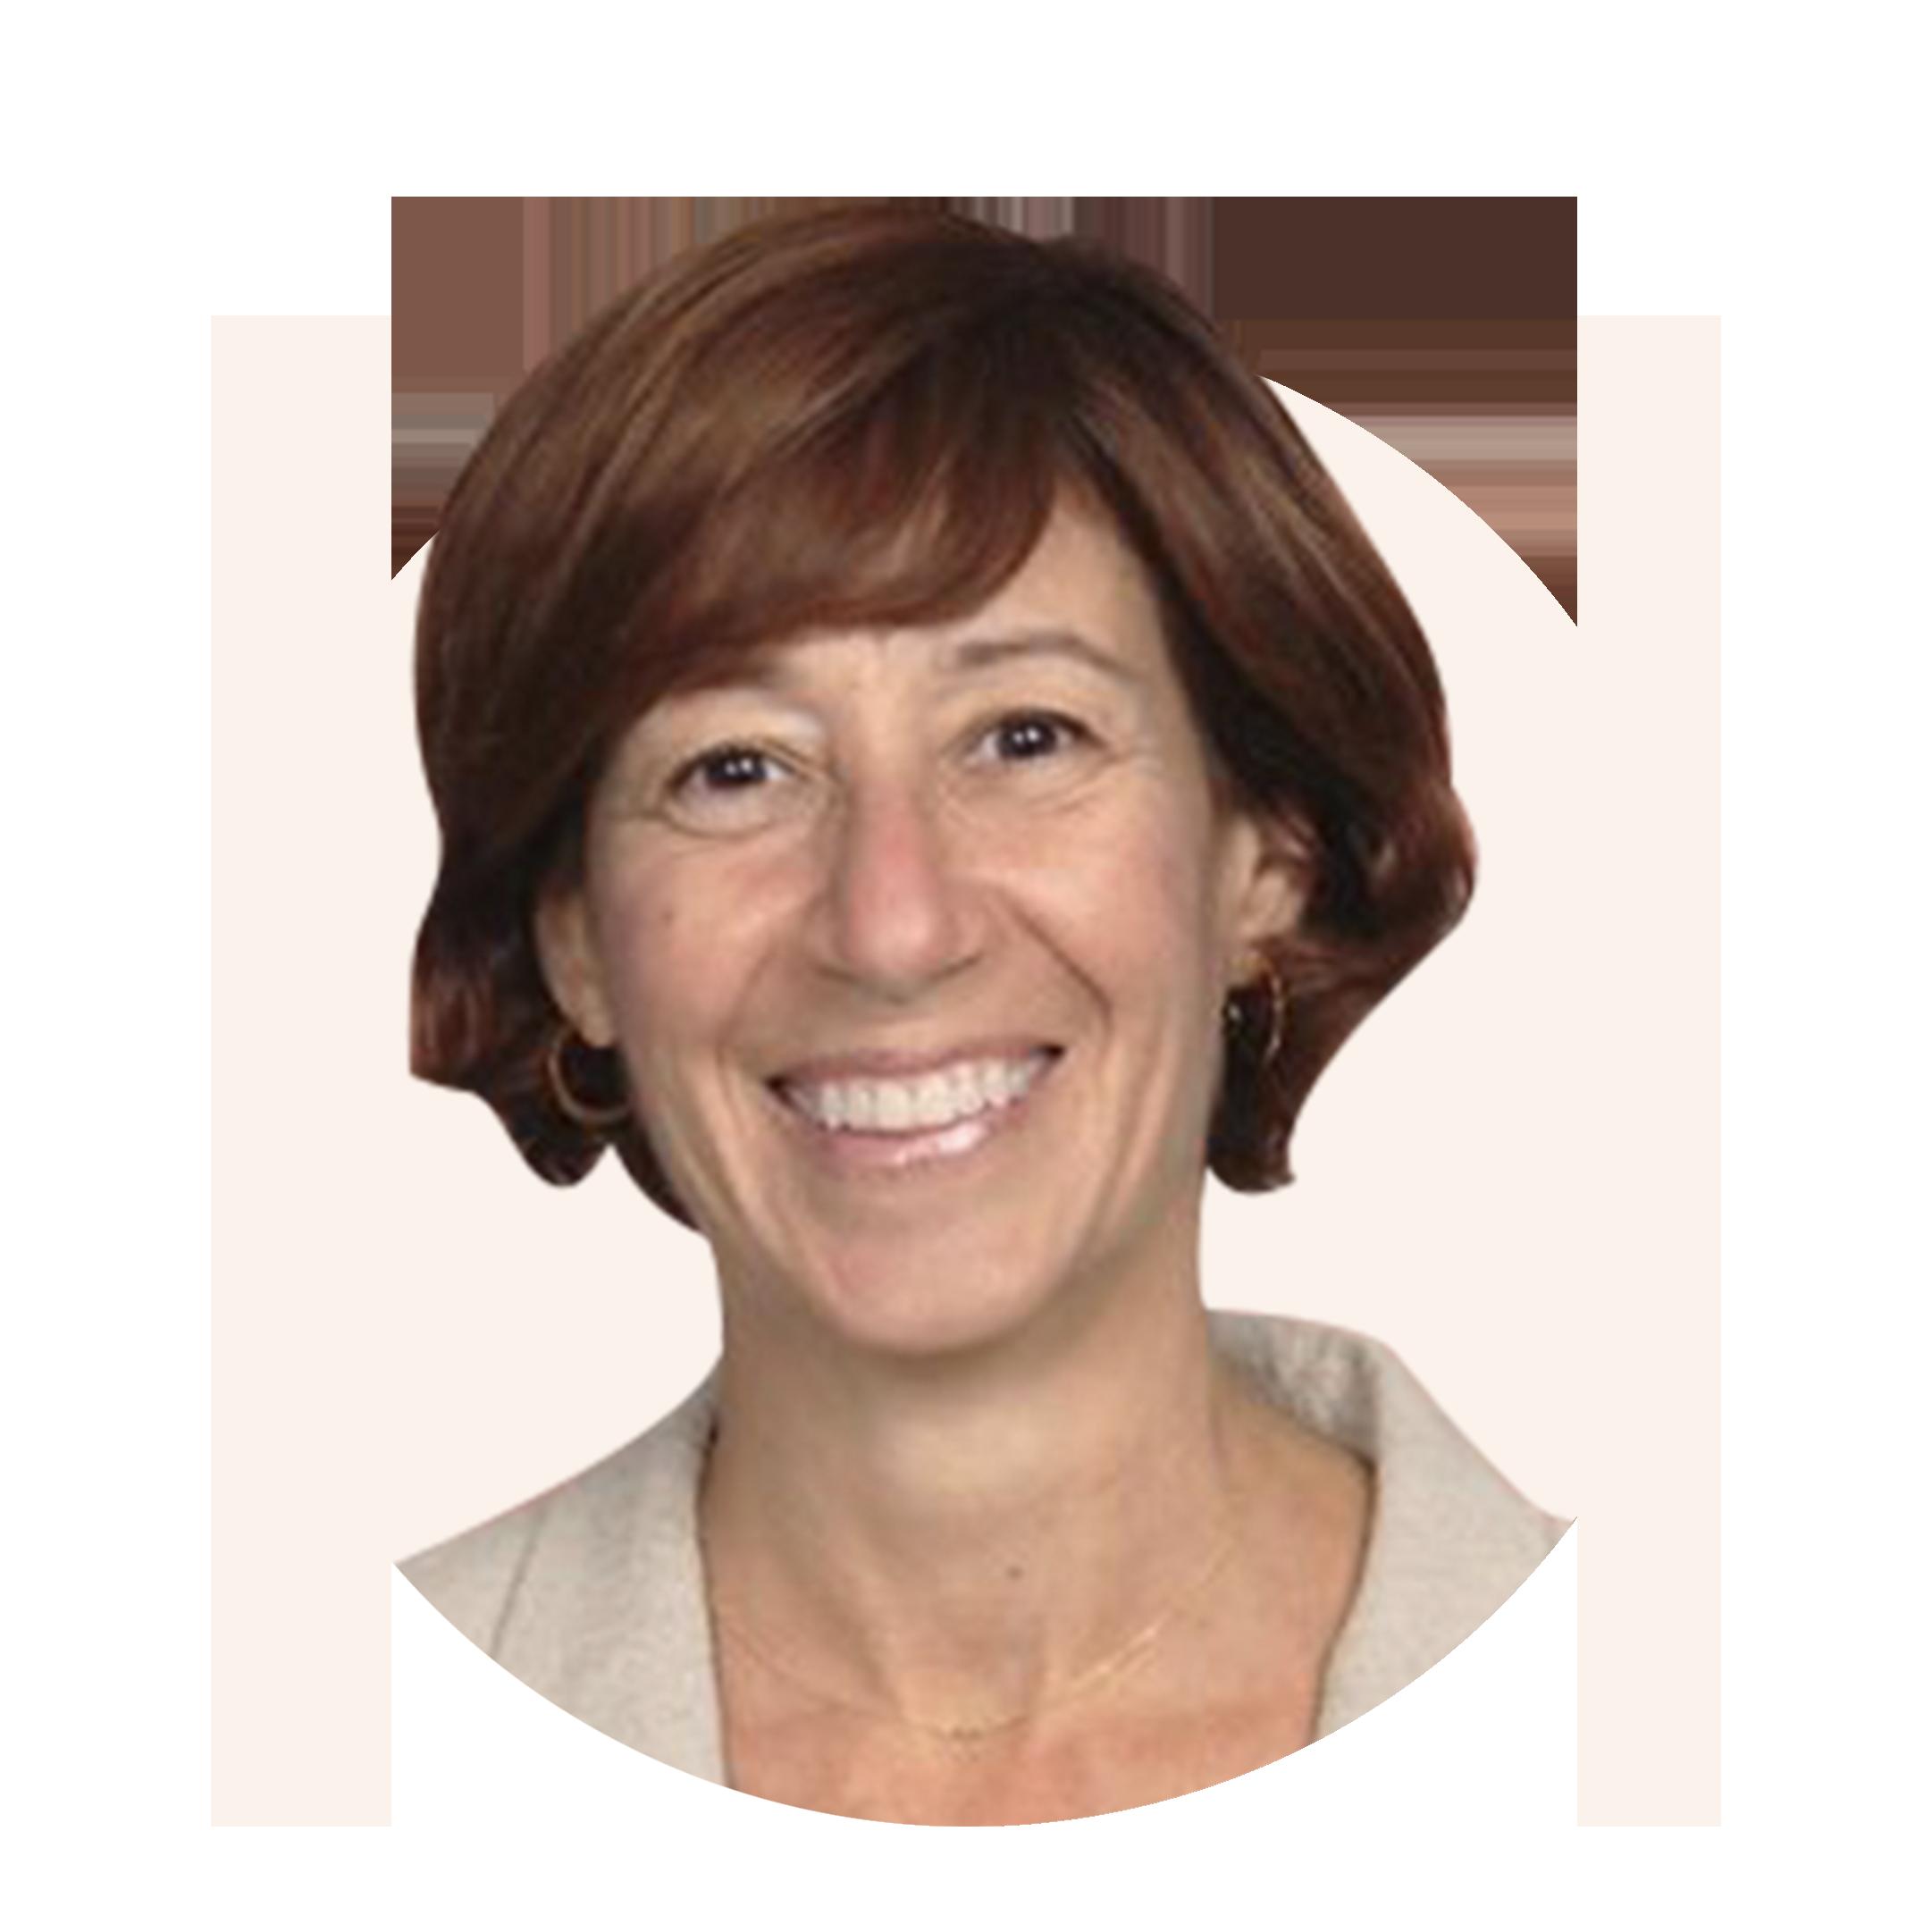 Portrait photo of Debra Raybold